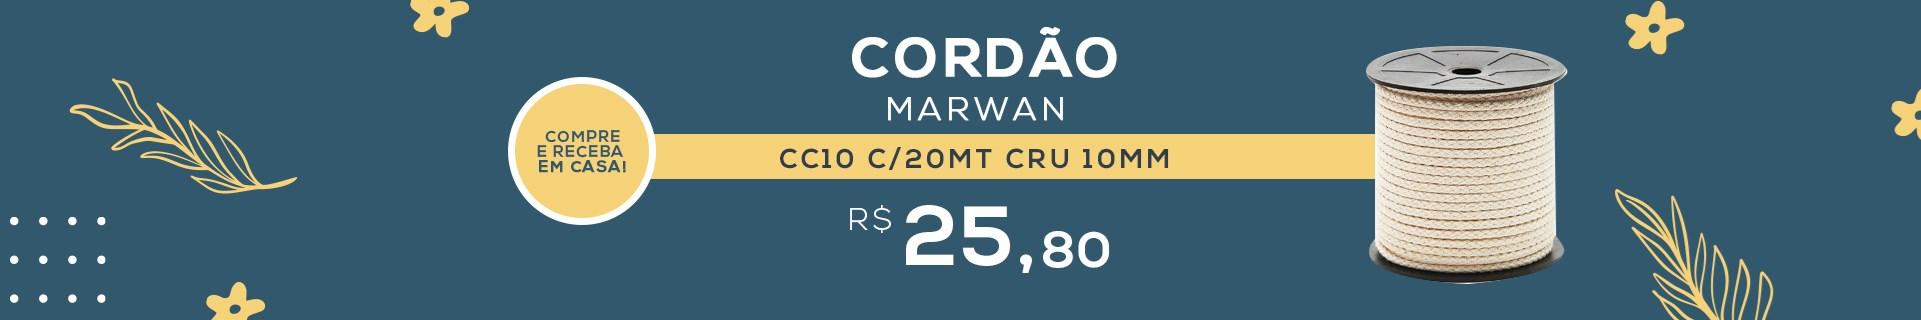 CORDAO MARWAN CC10 C/20MT CRU